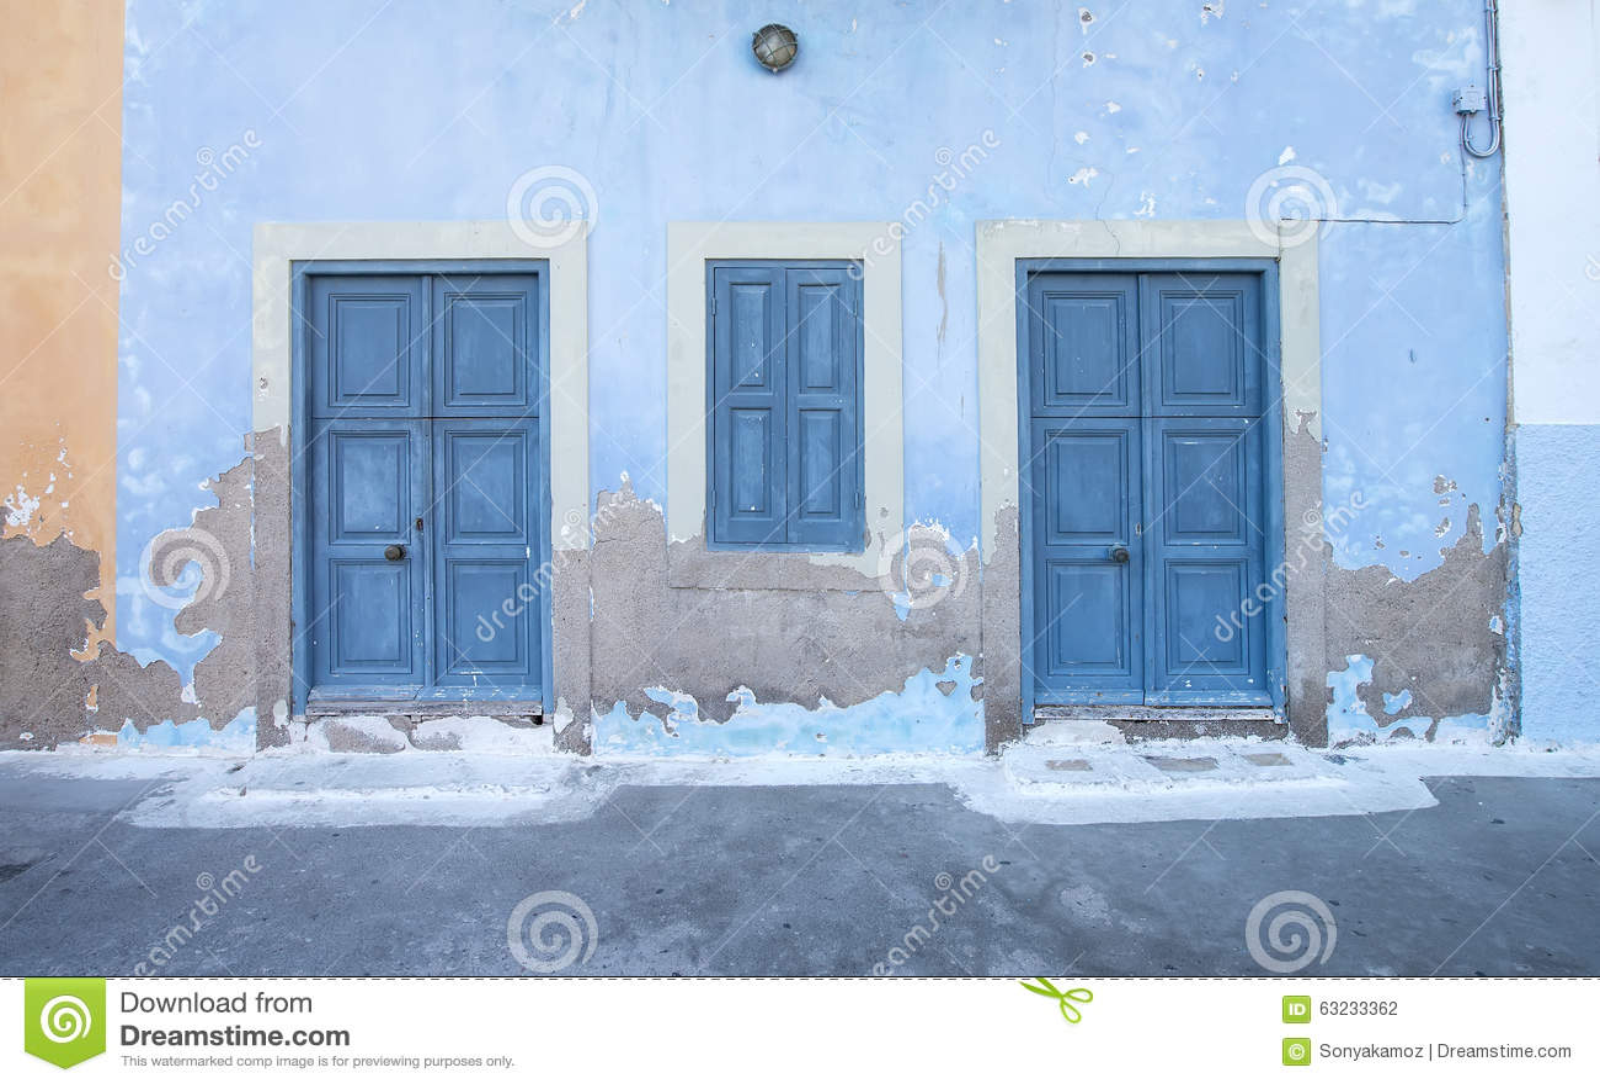 Mediterranean style exterior. Blue wooden doors